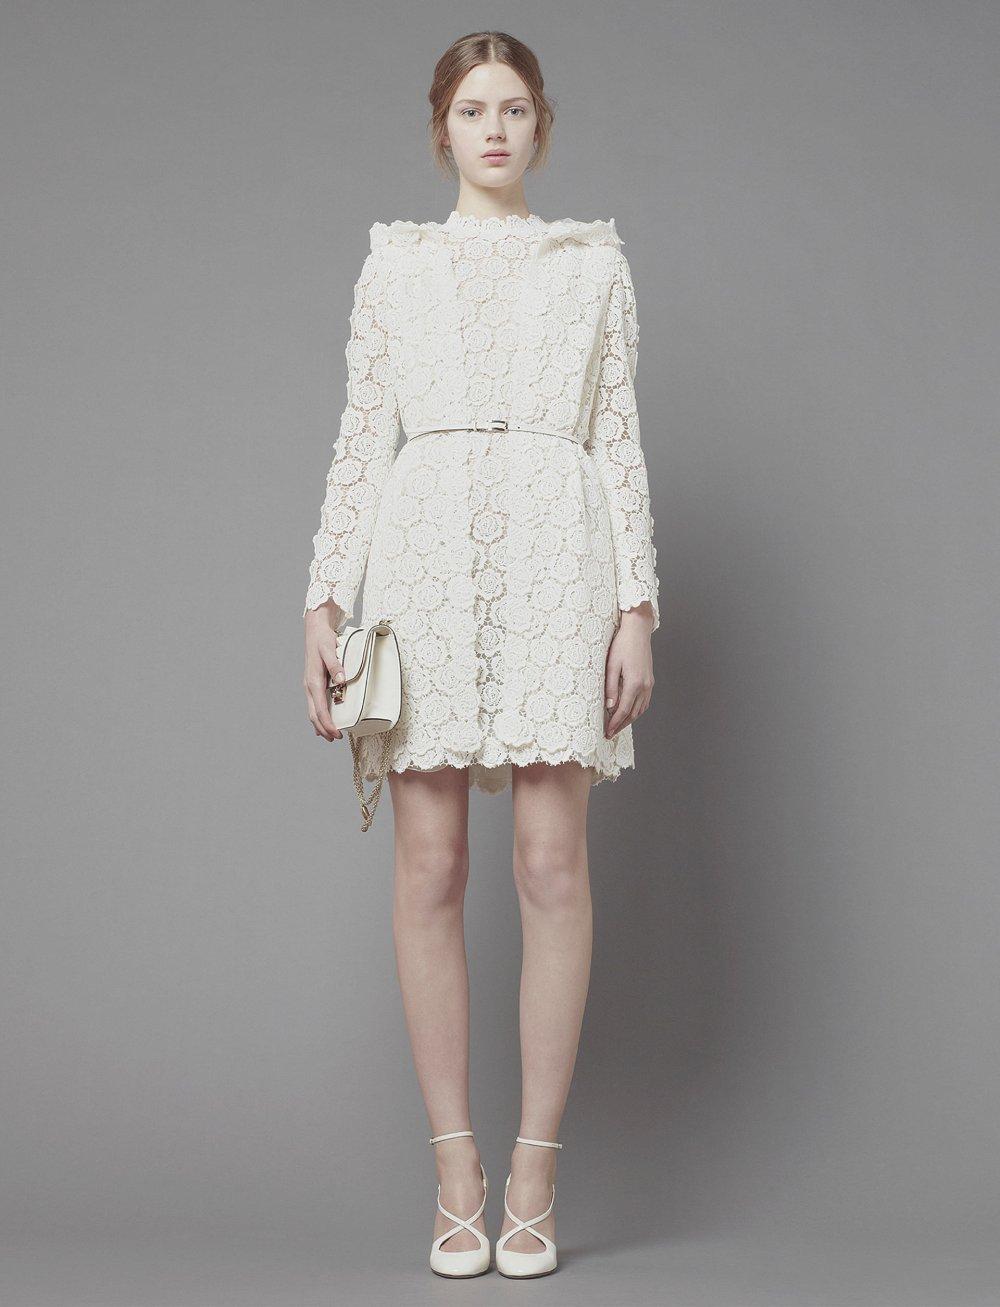 14634-ready-to-wear-fall-2013